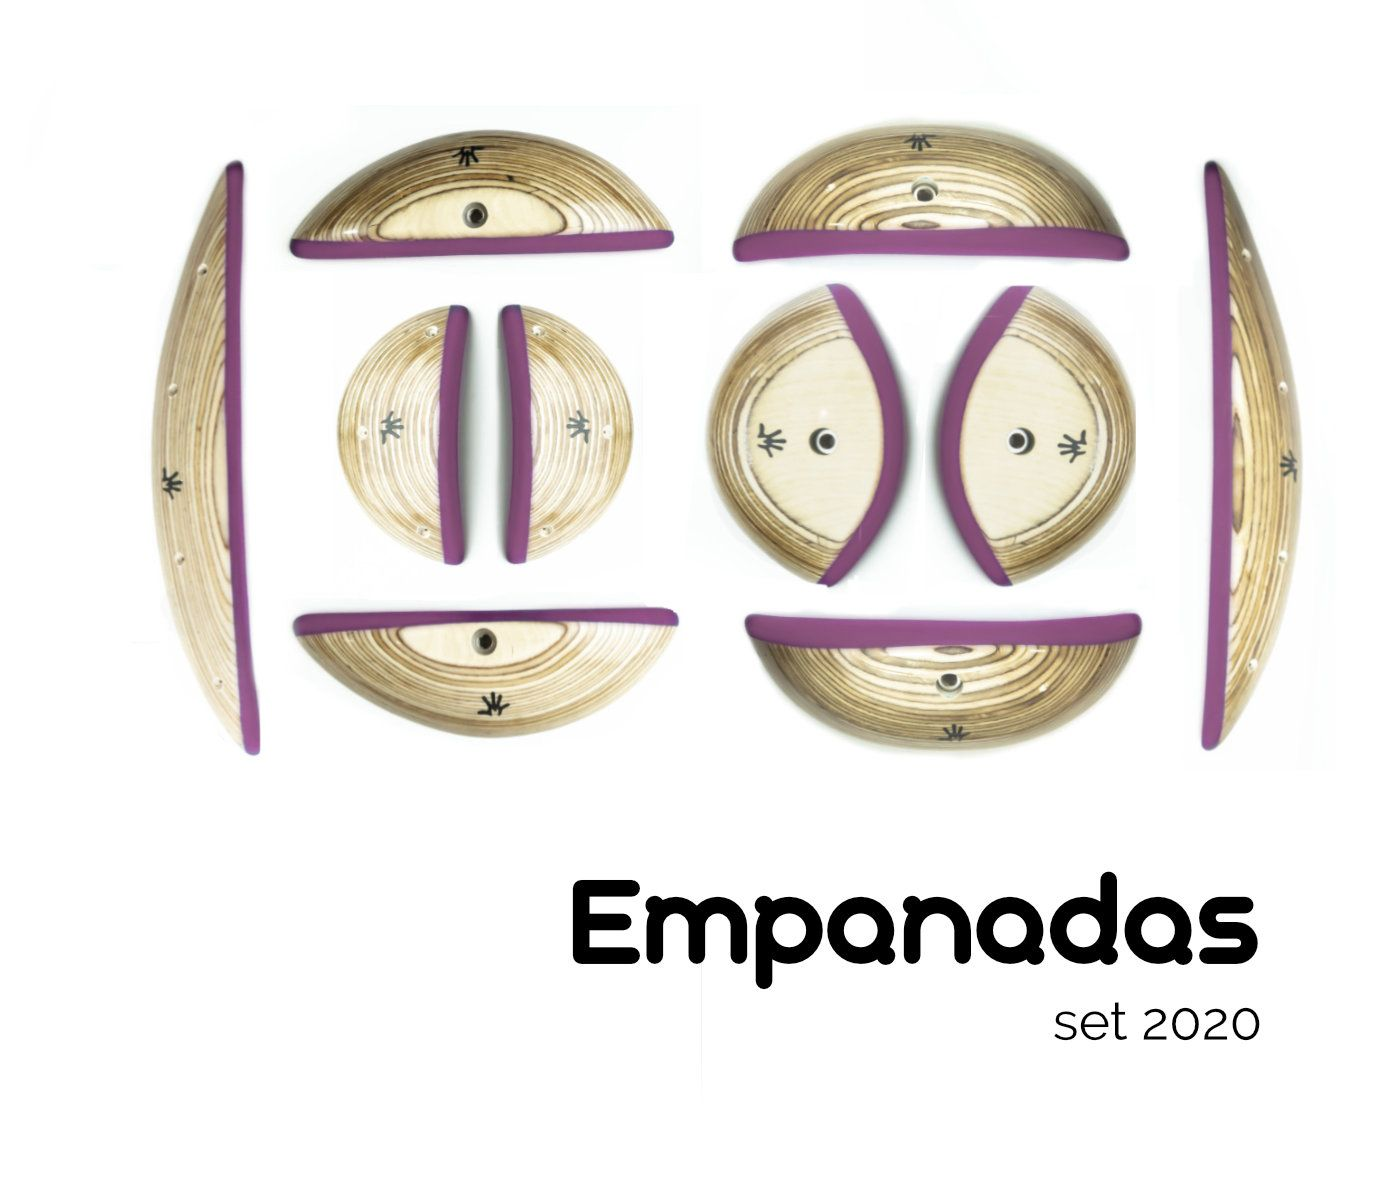 Agarres-para-escalar-set-empanadas-Muta-2020-sets